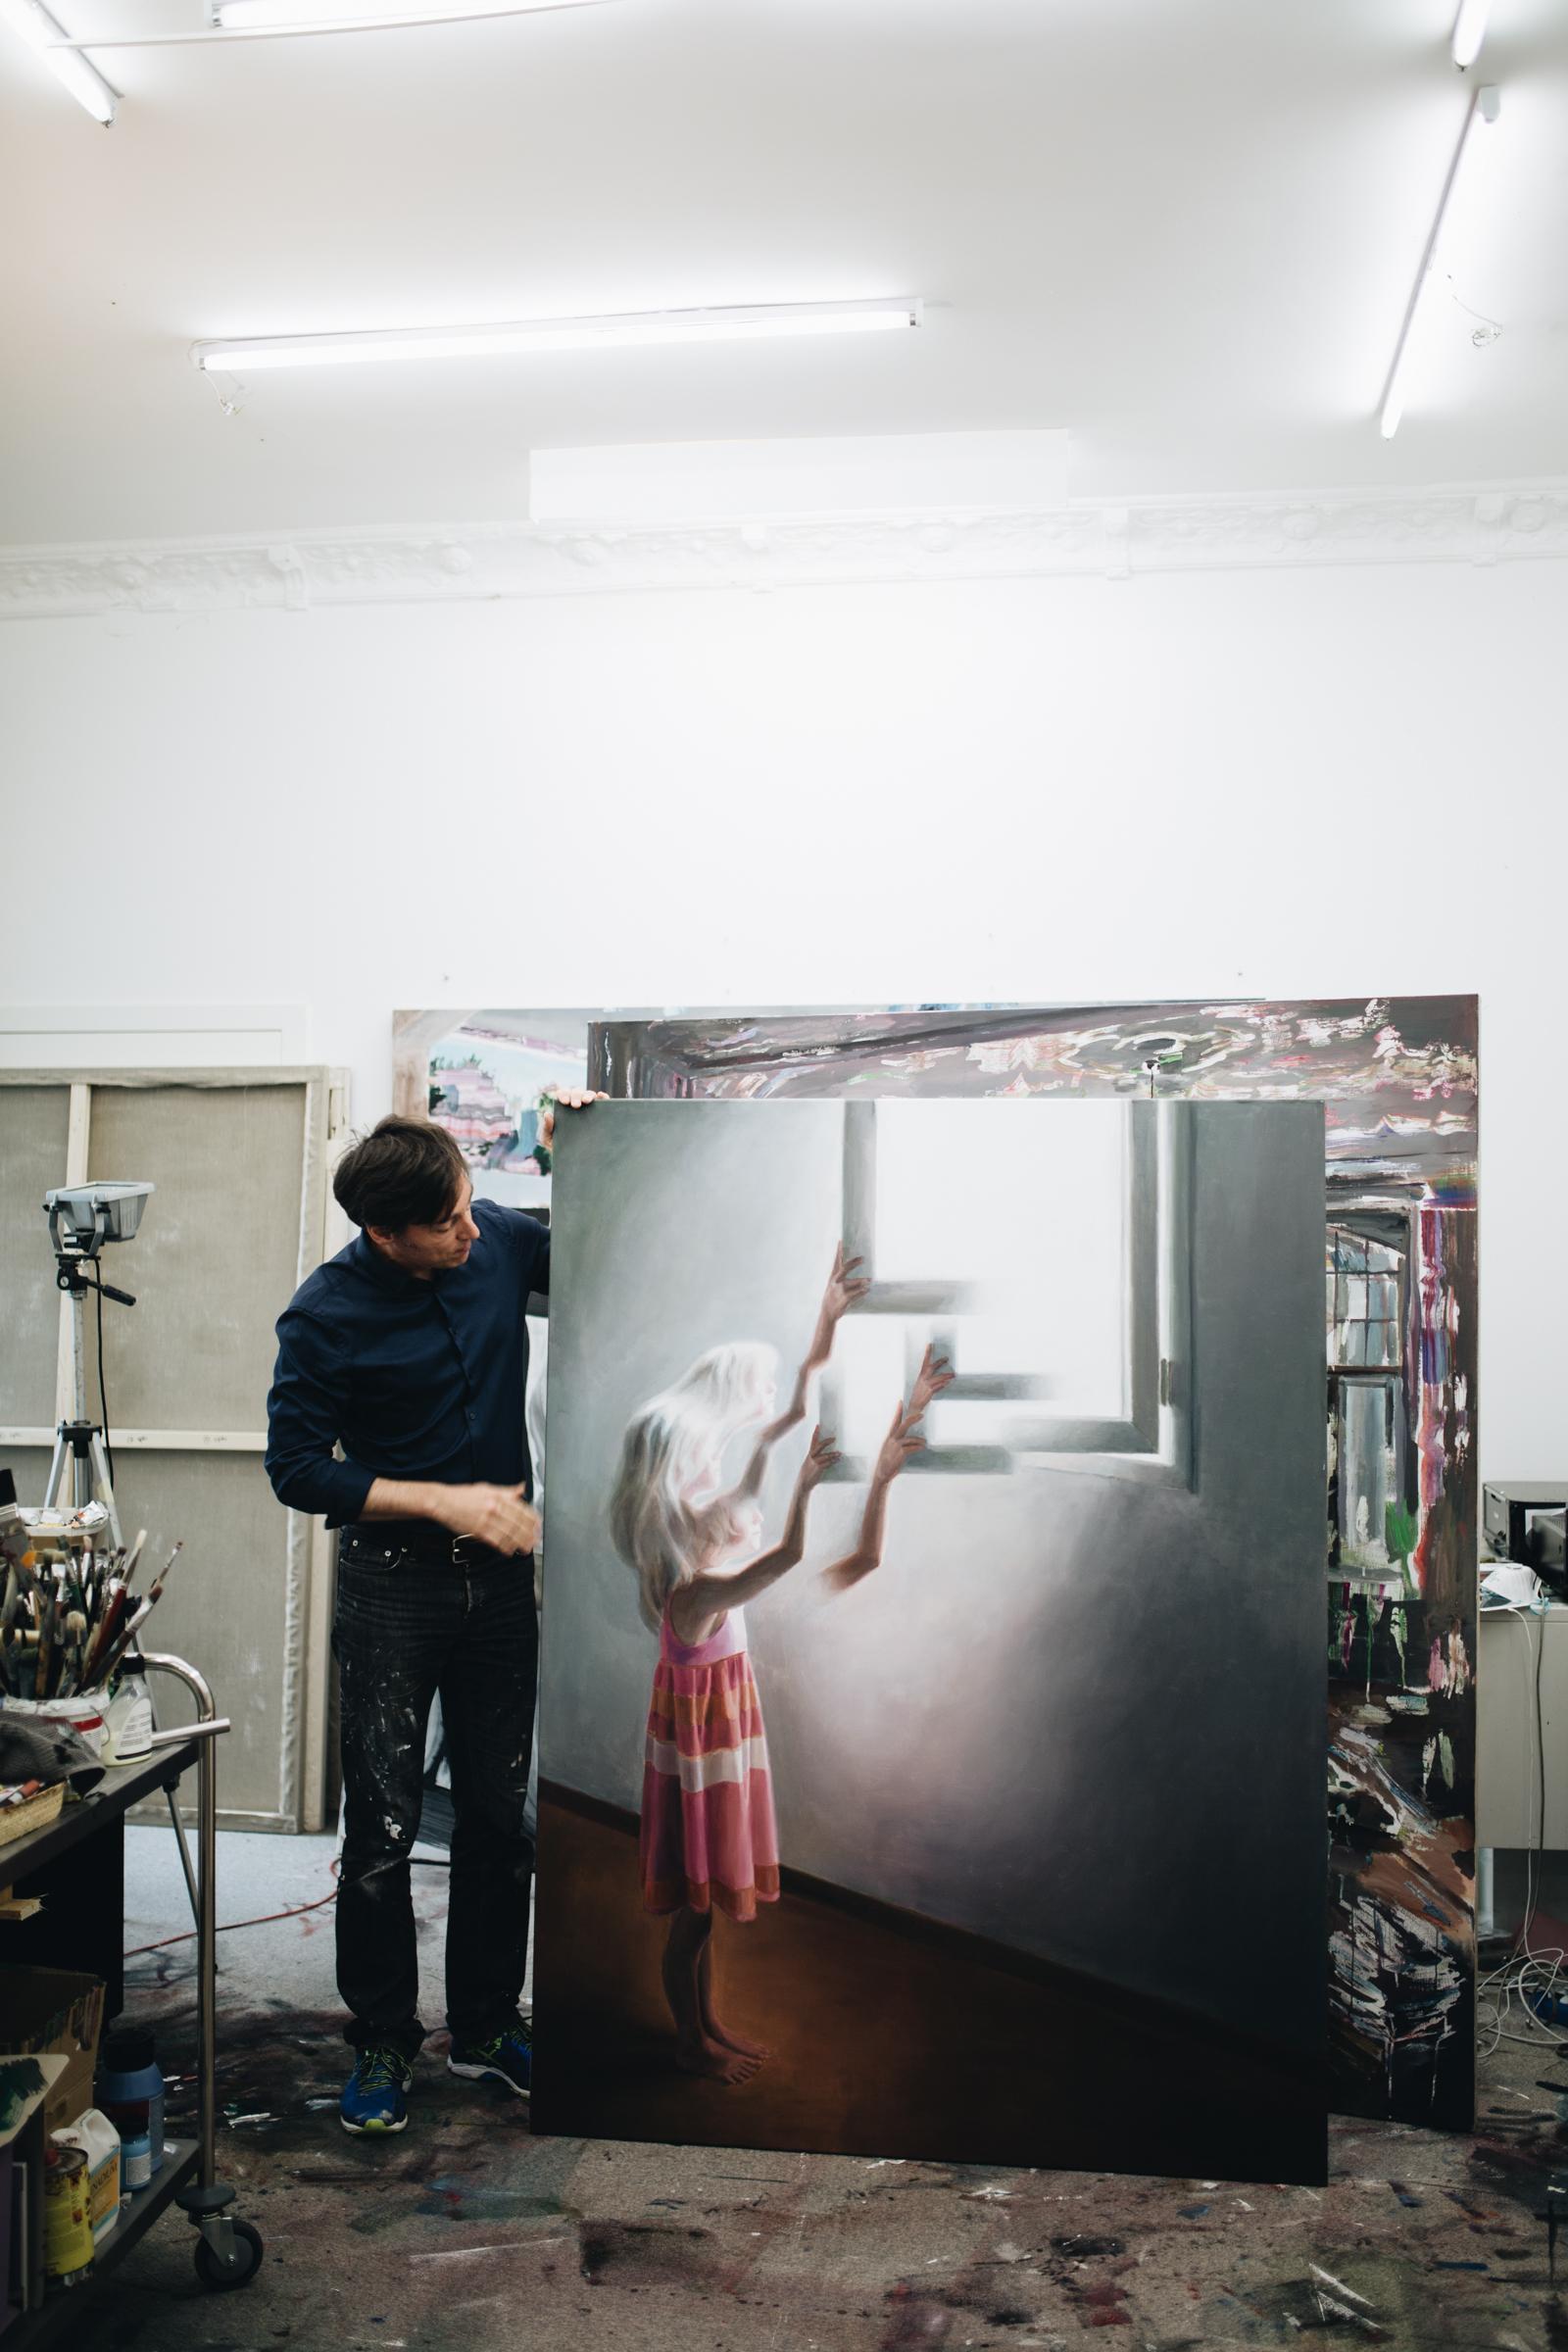 Atelierbesuch bei Dénesh Ghyczy